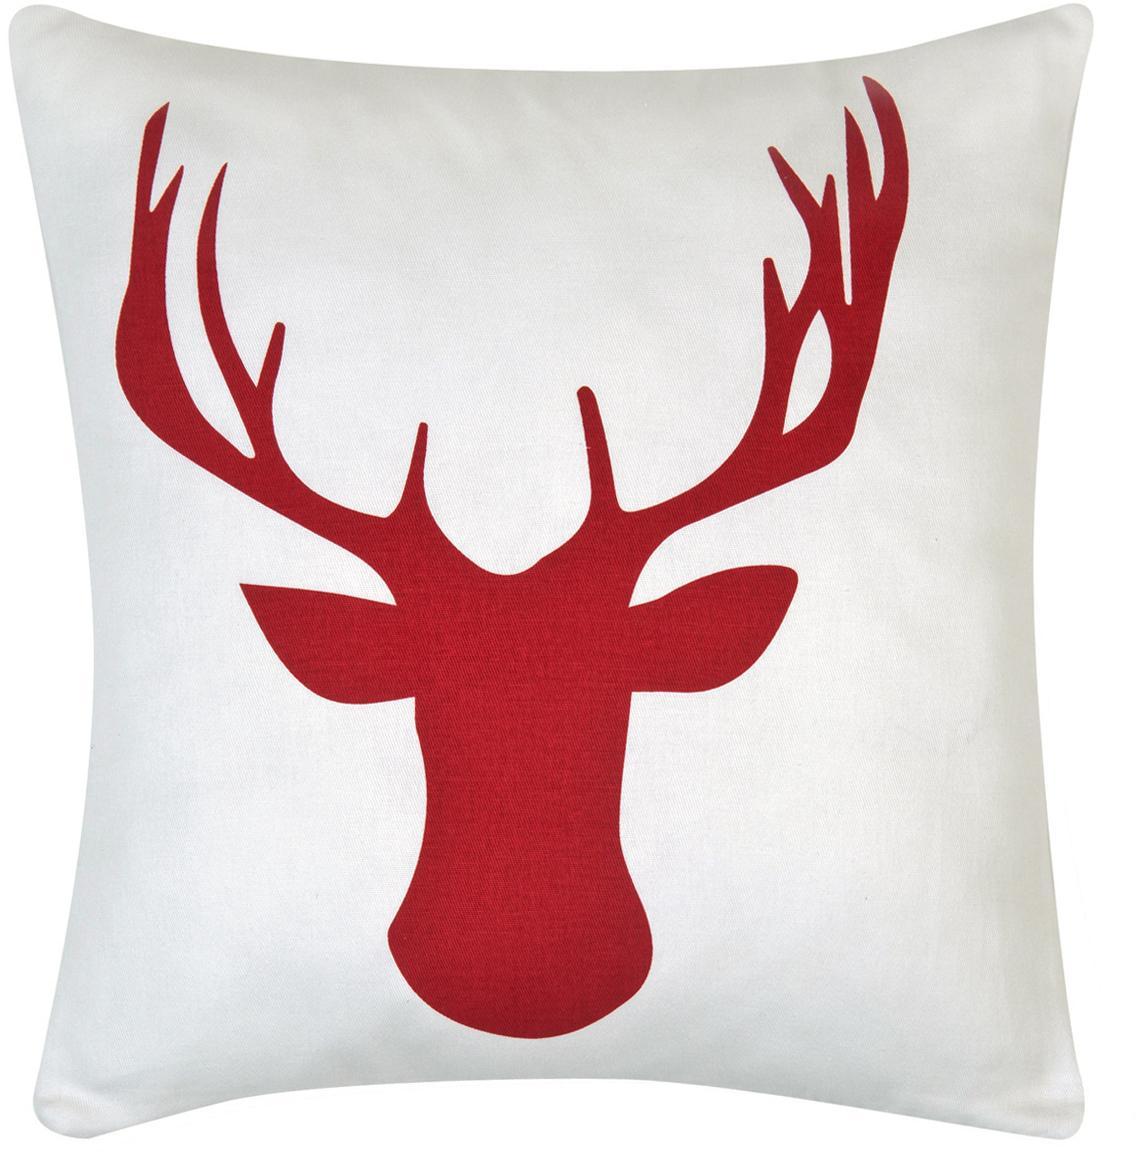 Federa arredo in bianco/rosso Deer, Cotone, tessuto panama, Rosso scuro, ecru, Larg. 40 x Lung. 40 cm